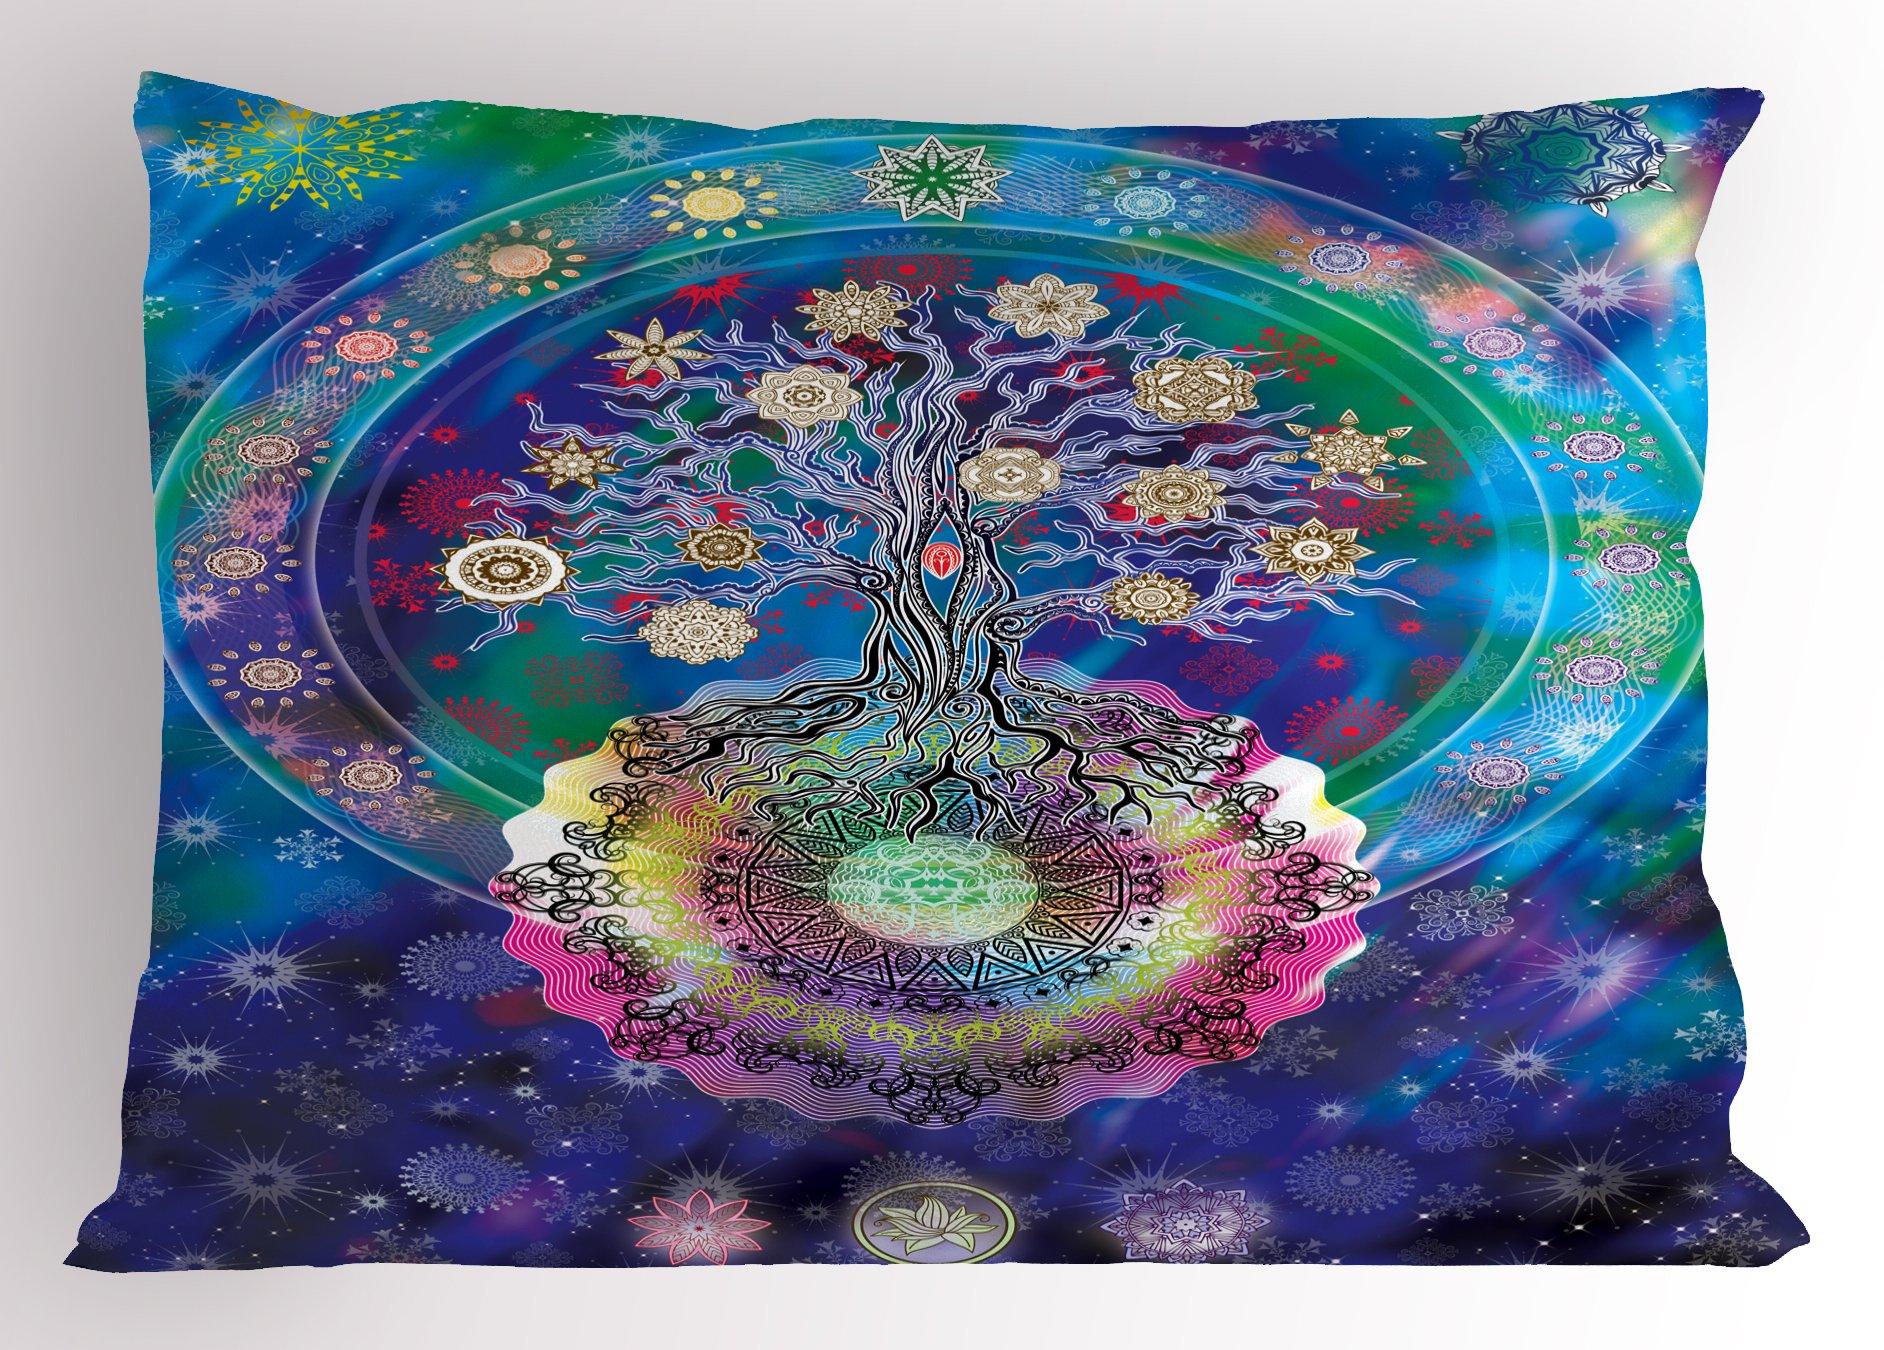 Ambesonne Mandala Pillow Sham, Tree of Life Floral Style Mandala Spiritual Artwork Meditation Peace Spa Design, Decorative Standard Queen Size Printed Pillowcase, 30 X 20 Inches, Blue Purple